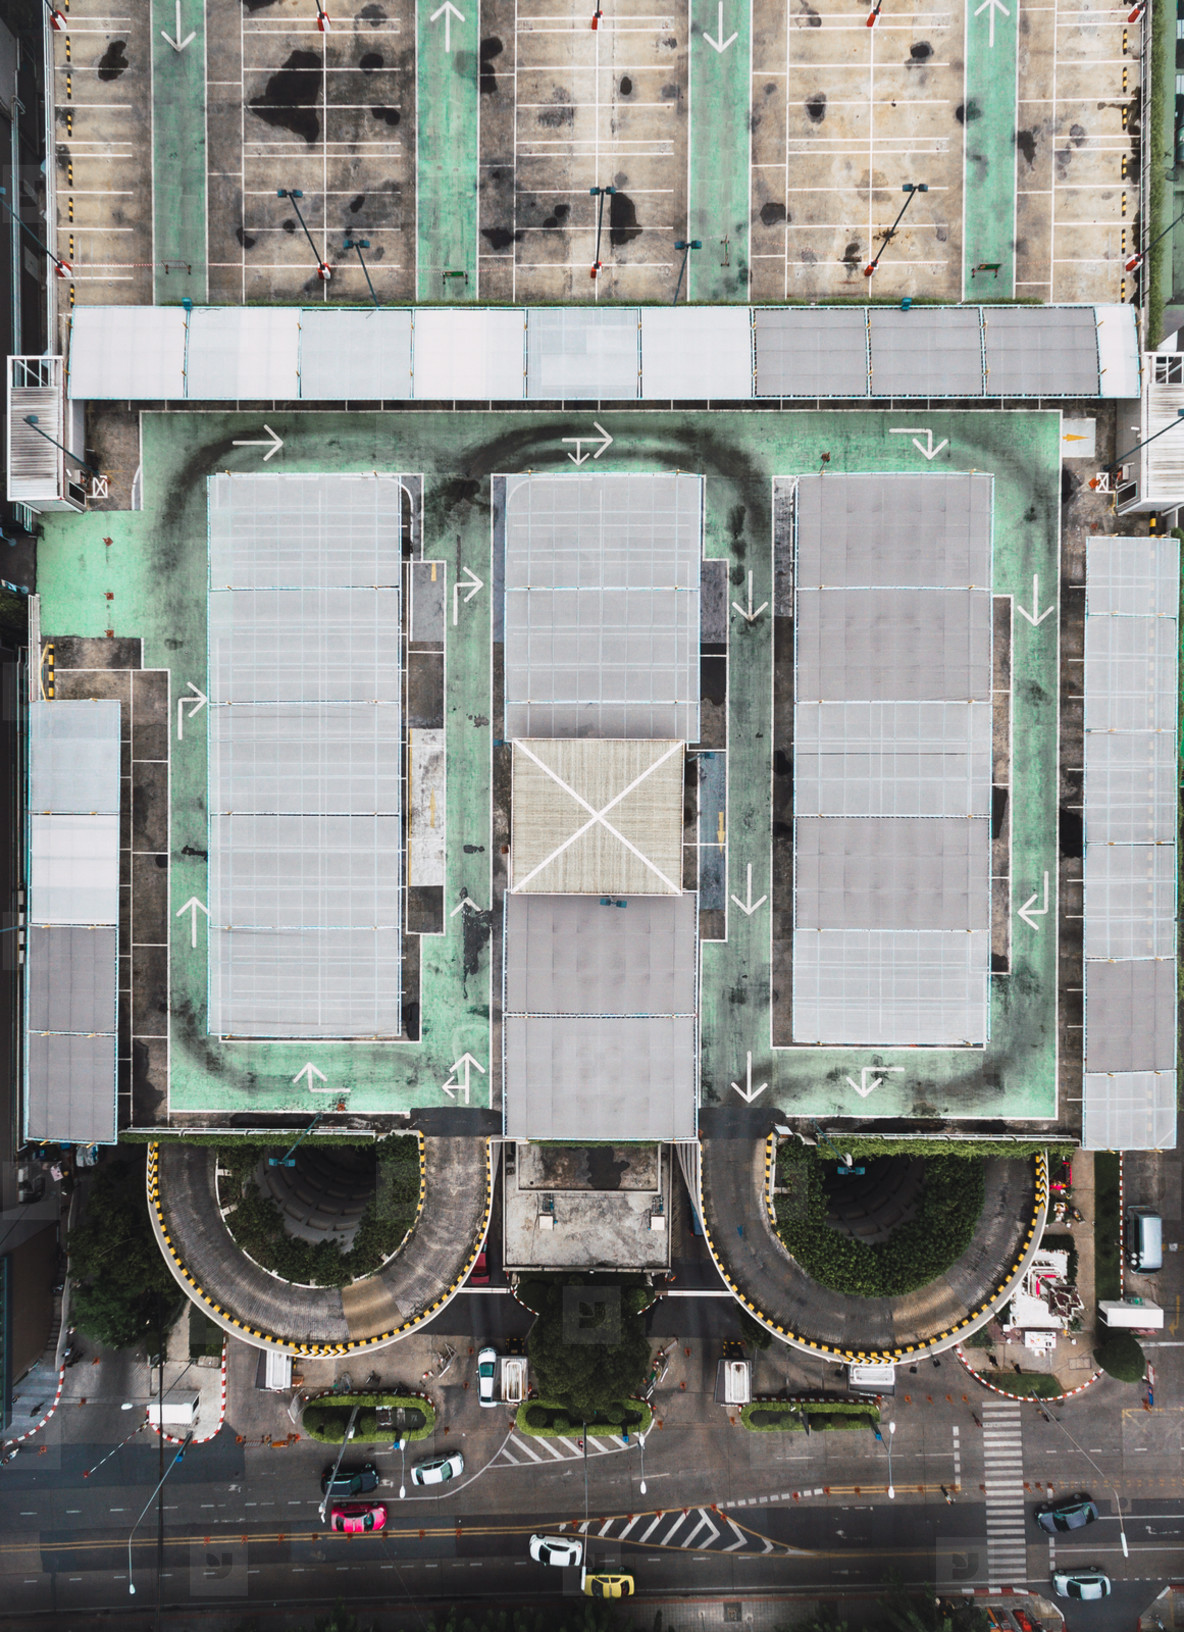 Parking Grid A05